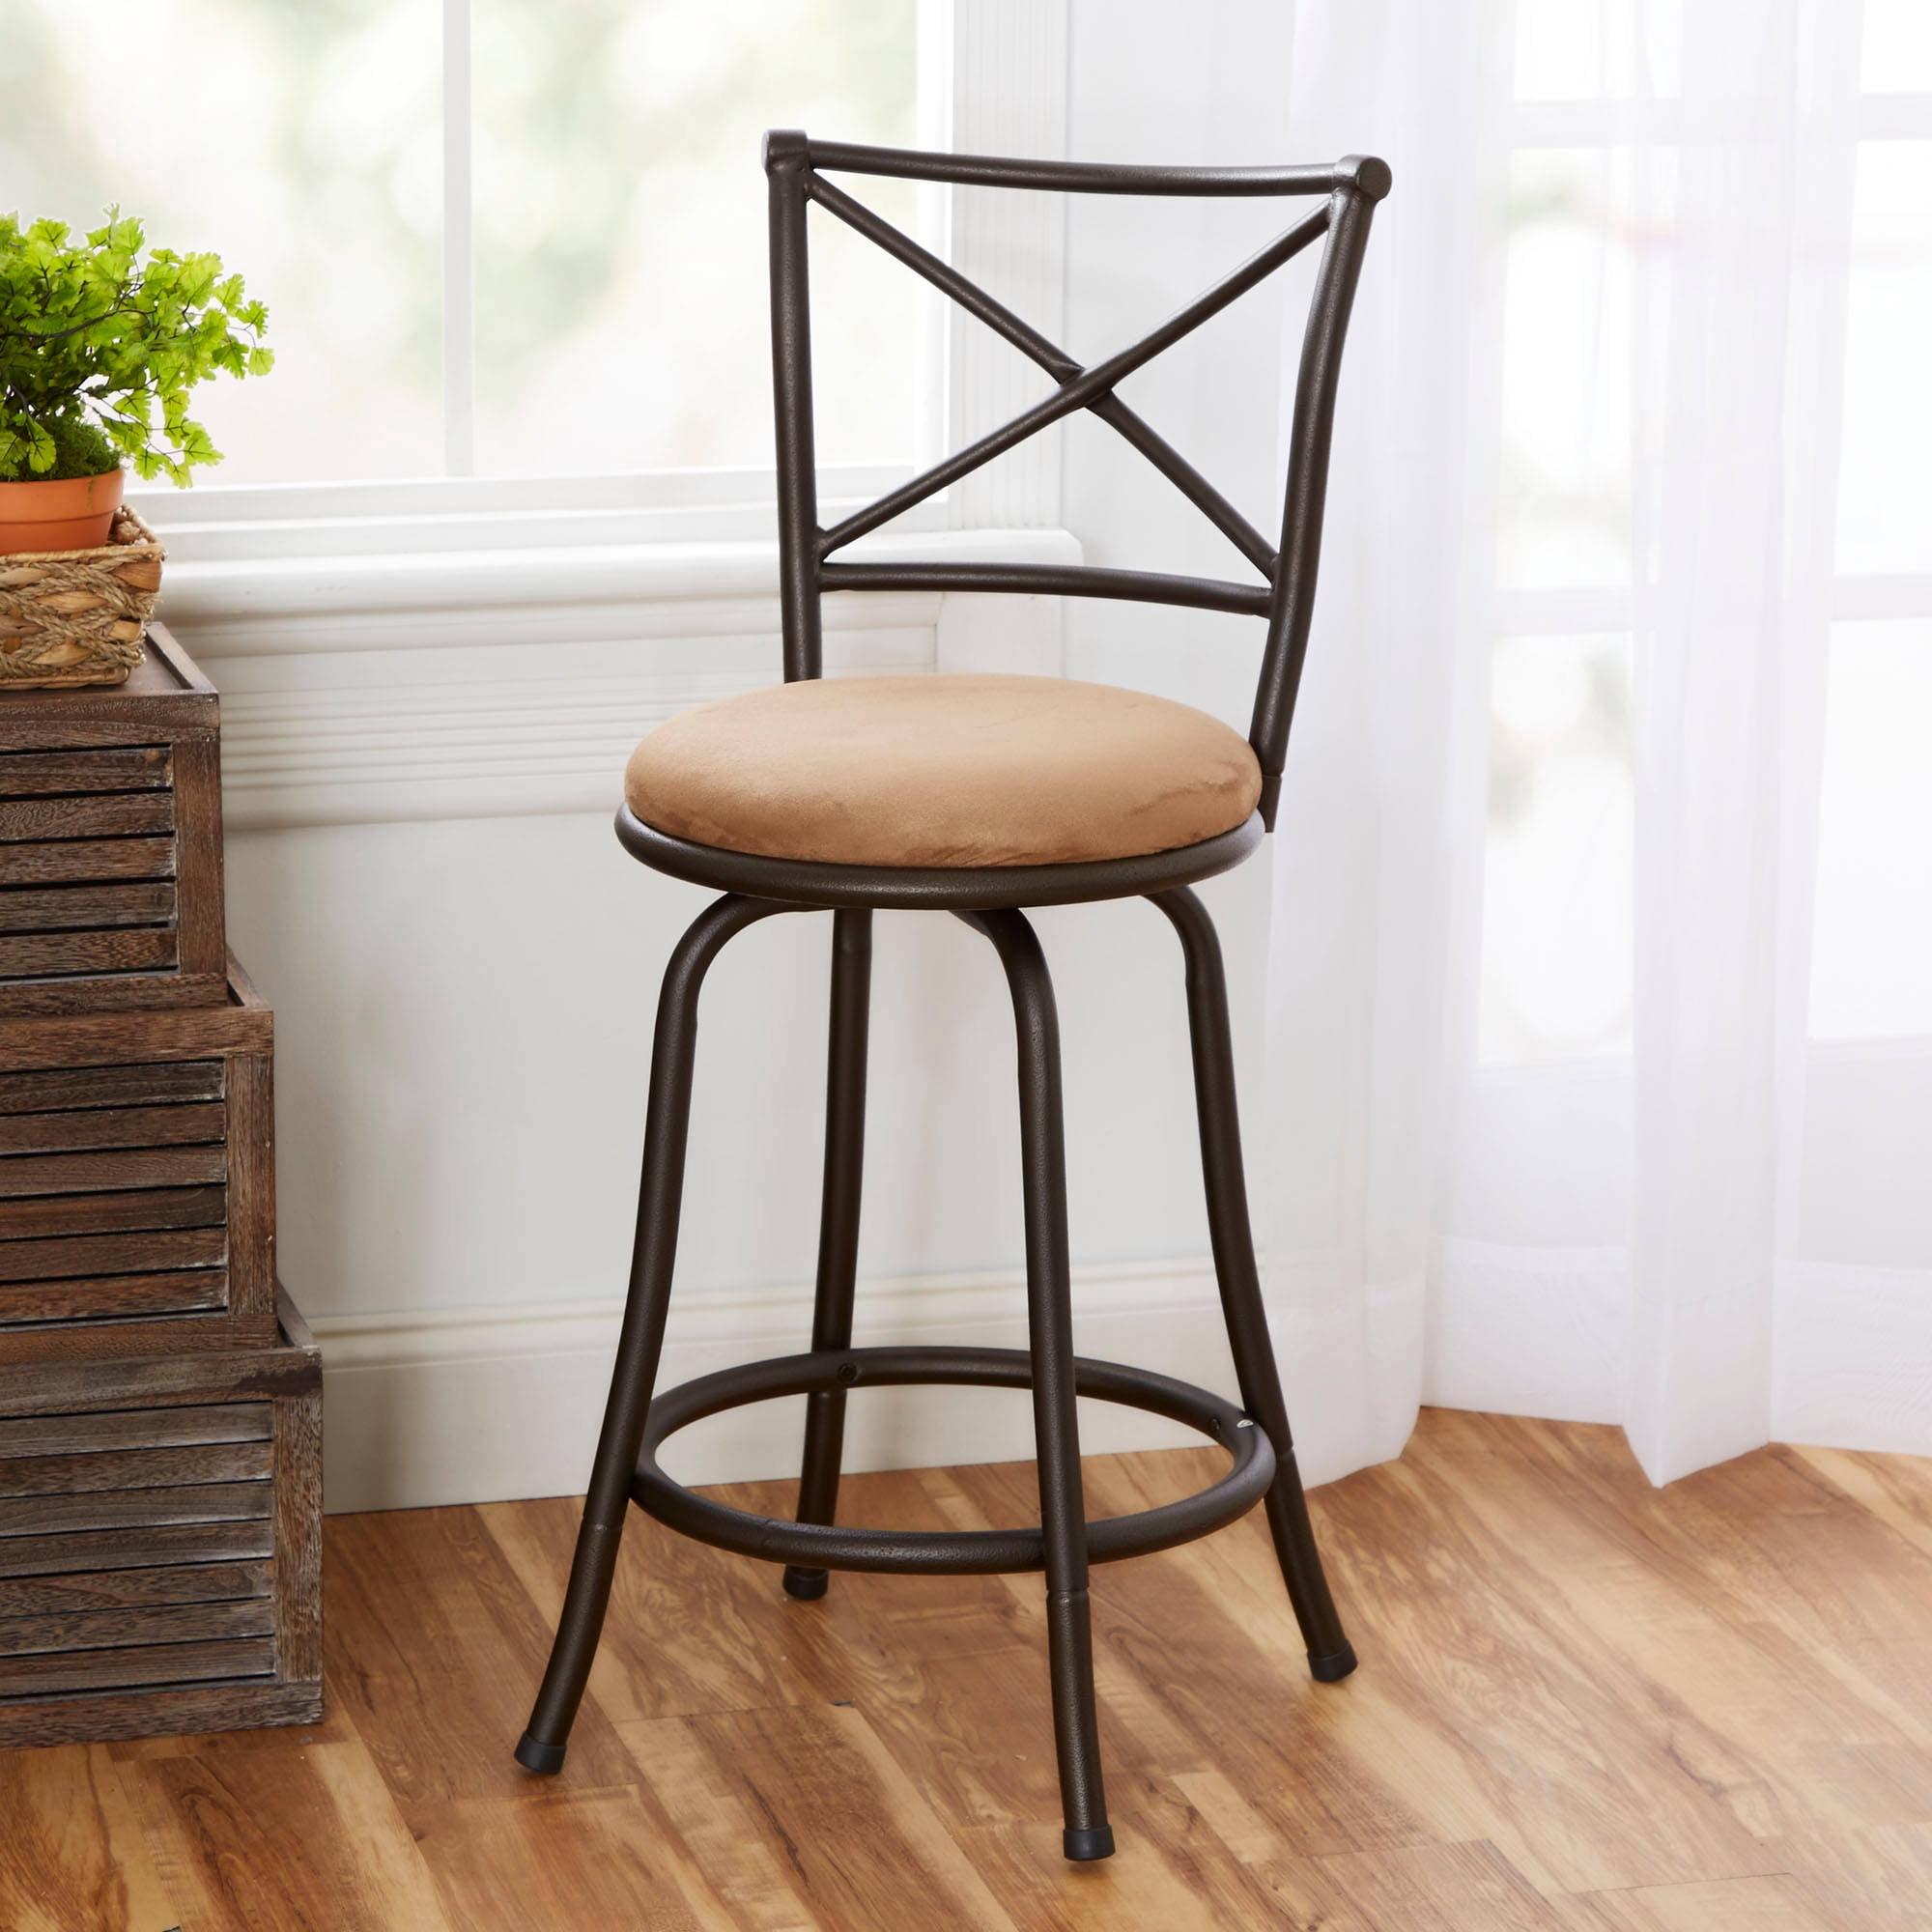 "Mainstays 24"" Swivel X-Back Hammered Bronze Barstool, Multiple Colors"